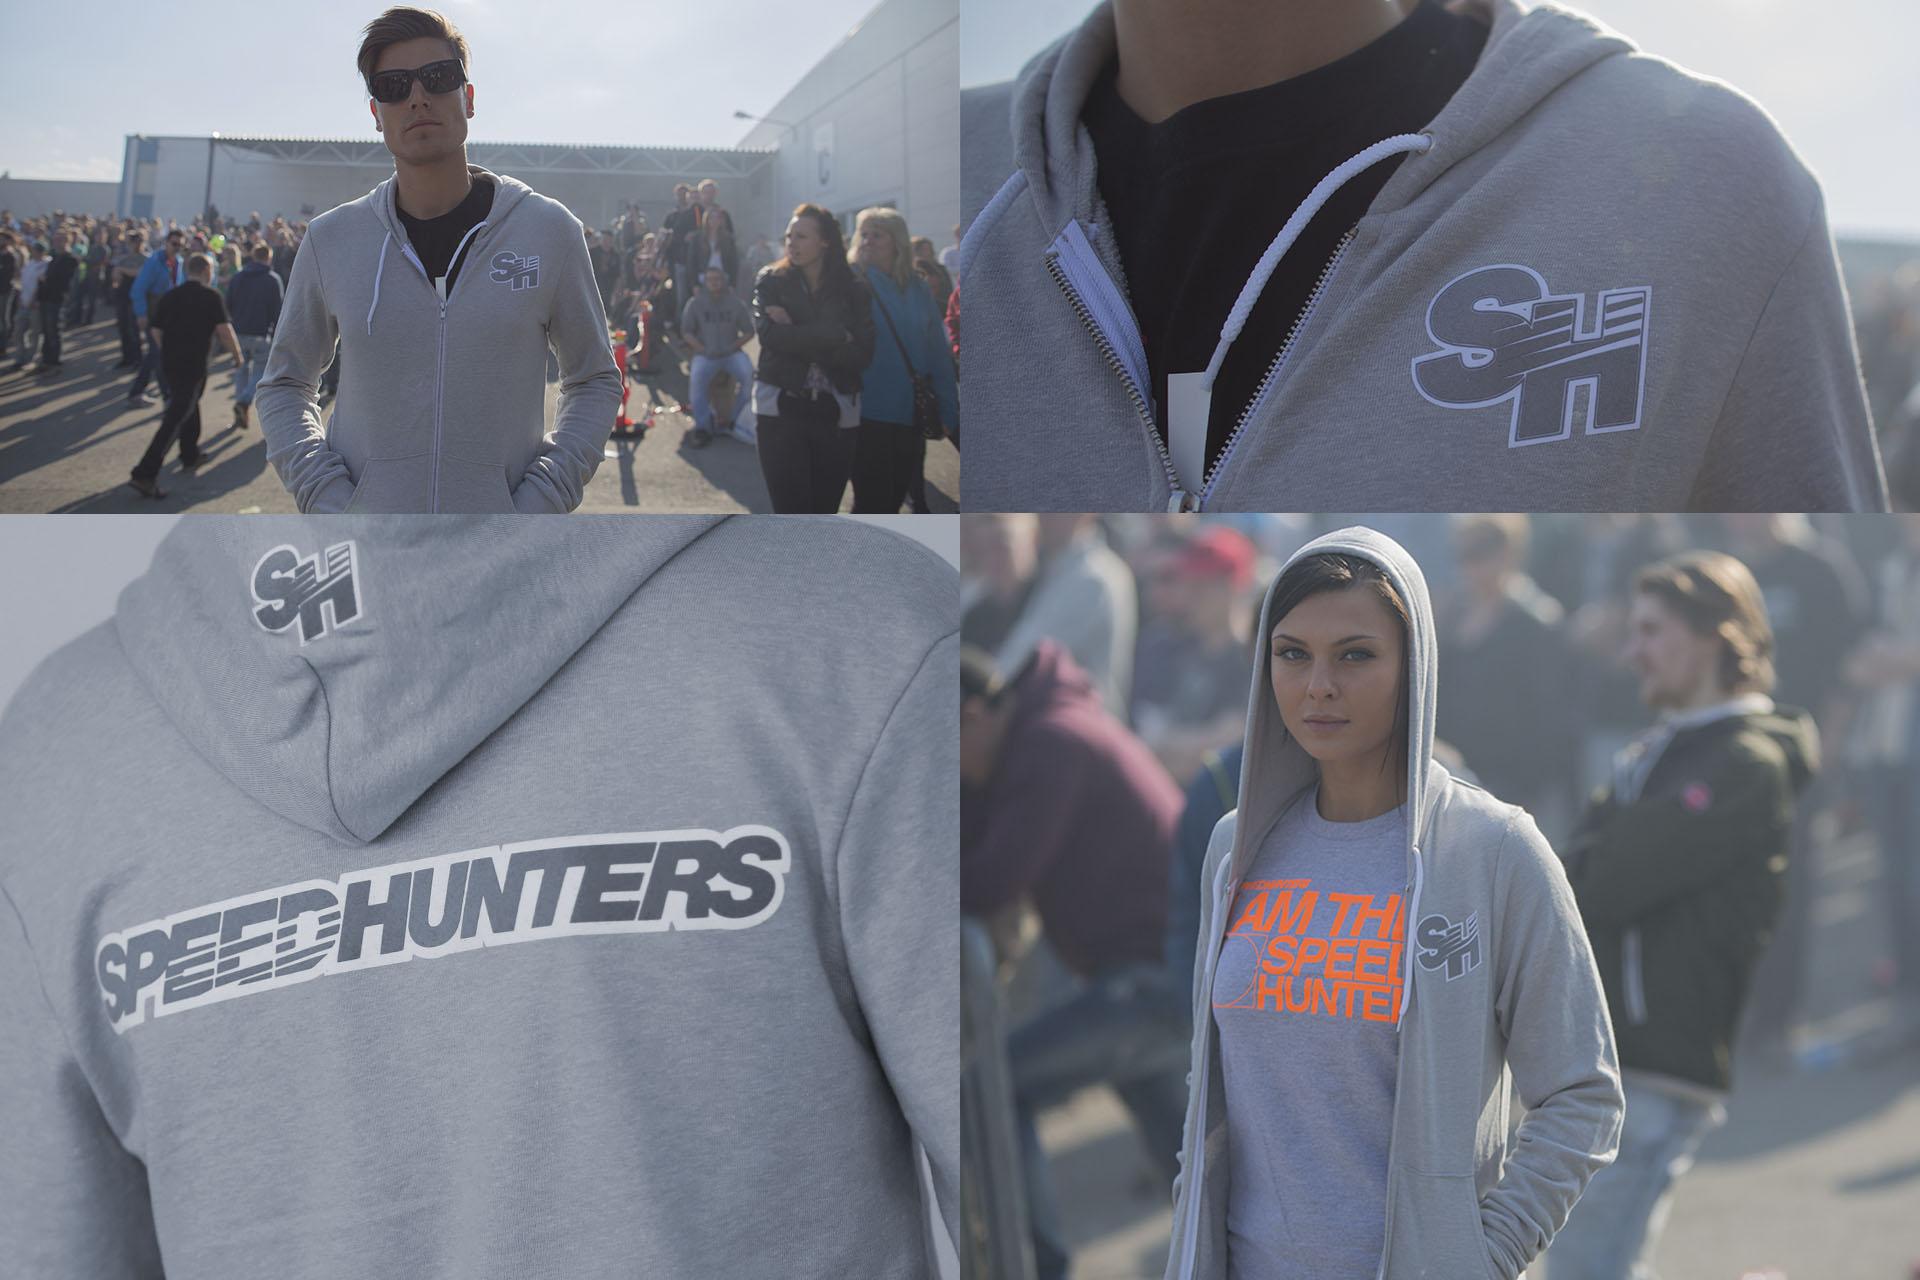 hoodie - Archives Speedhunters